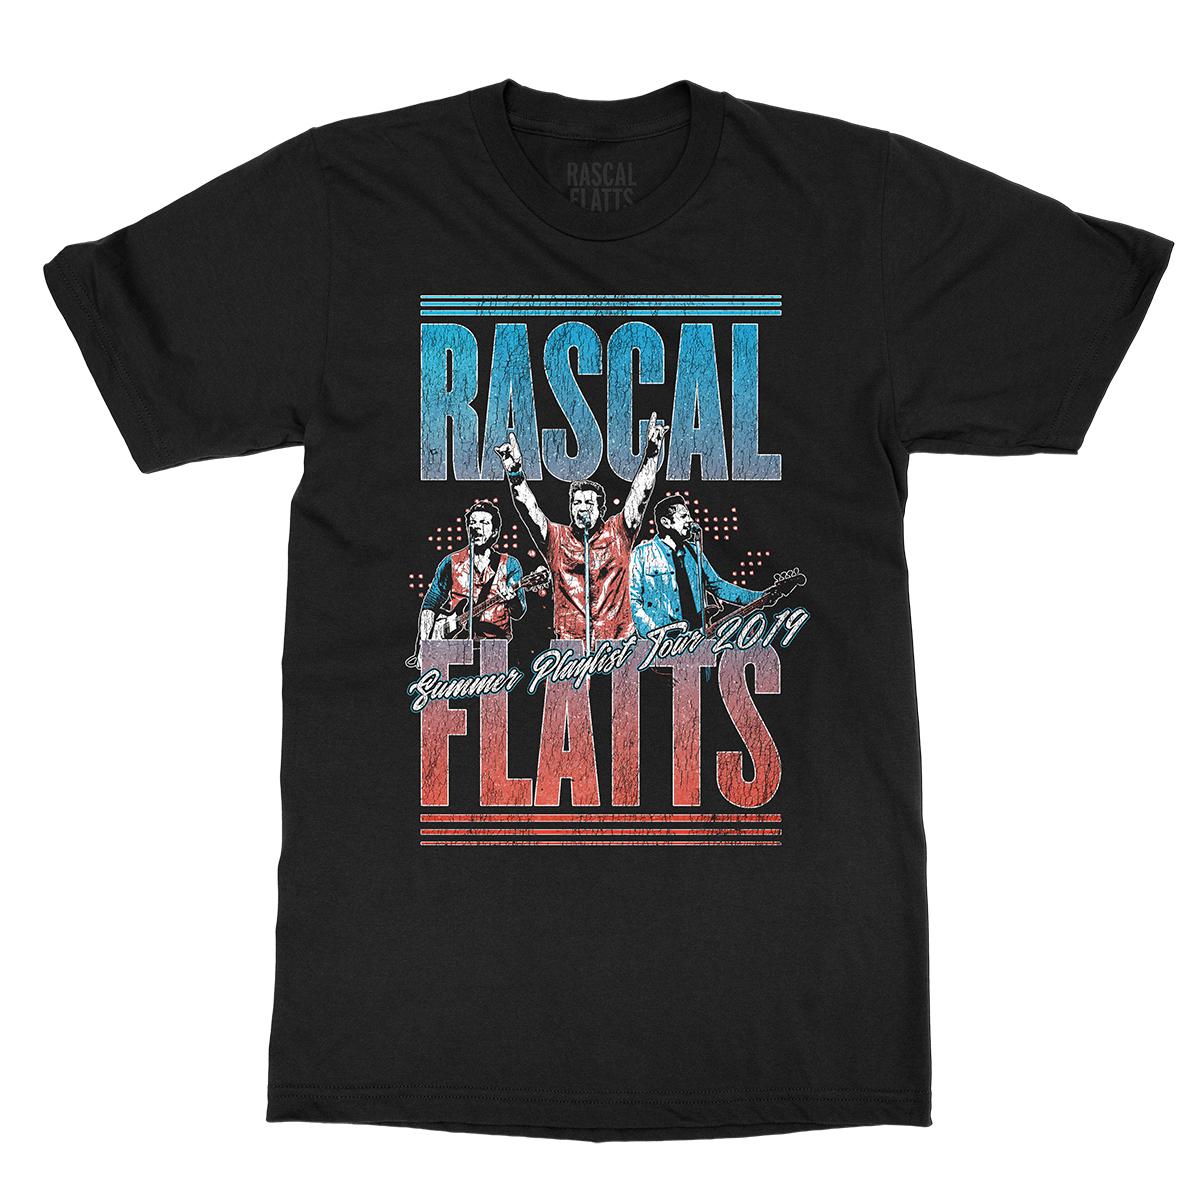 Summer Playlist Tour Black Photo T-Shirt